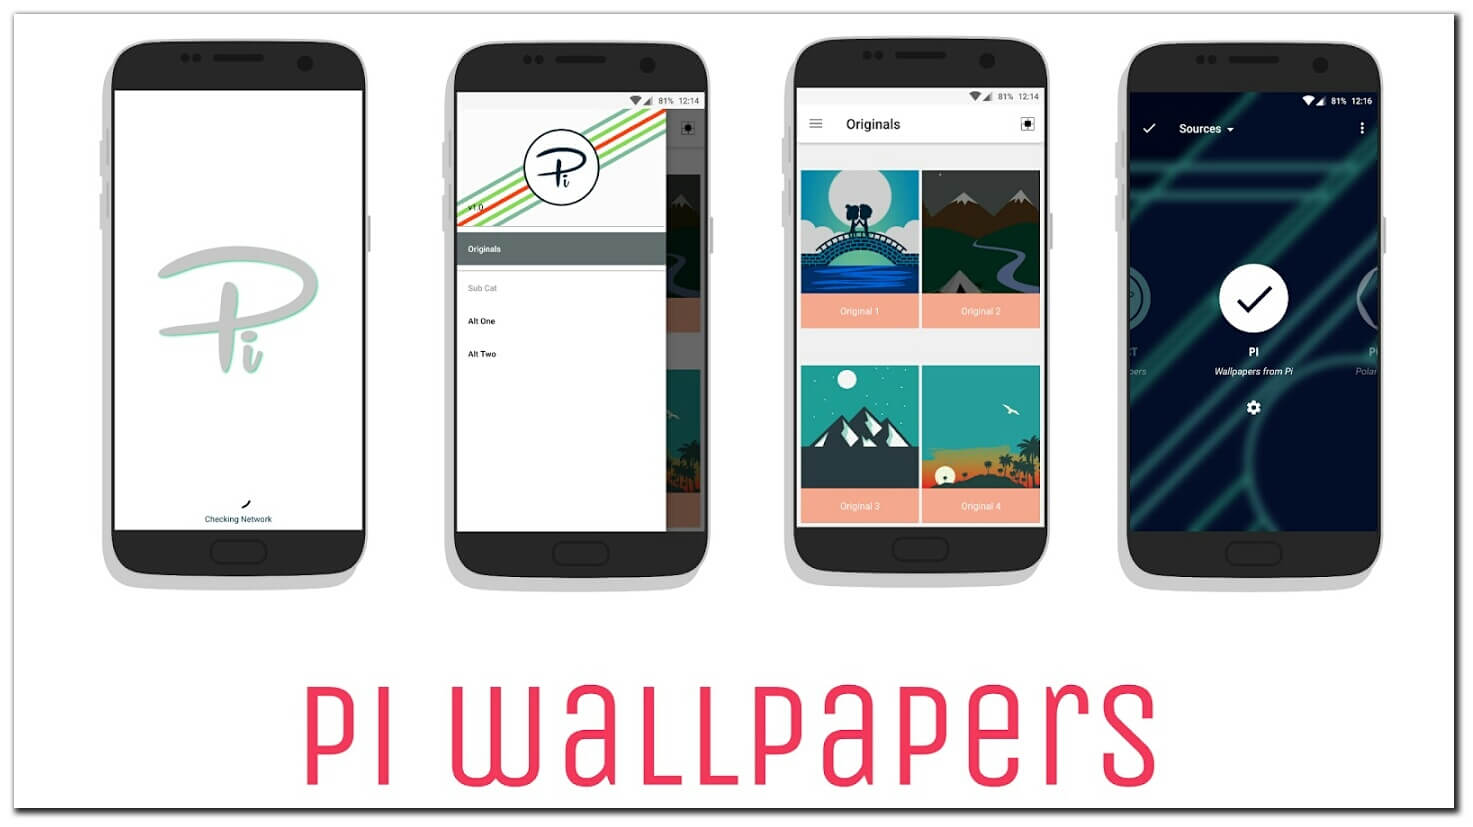 PI wallpapers v1